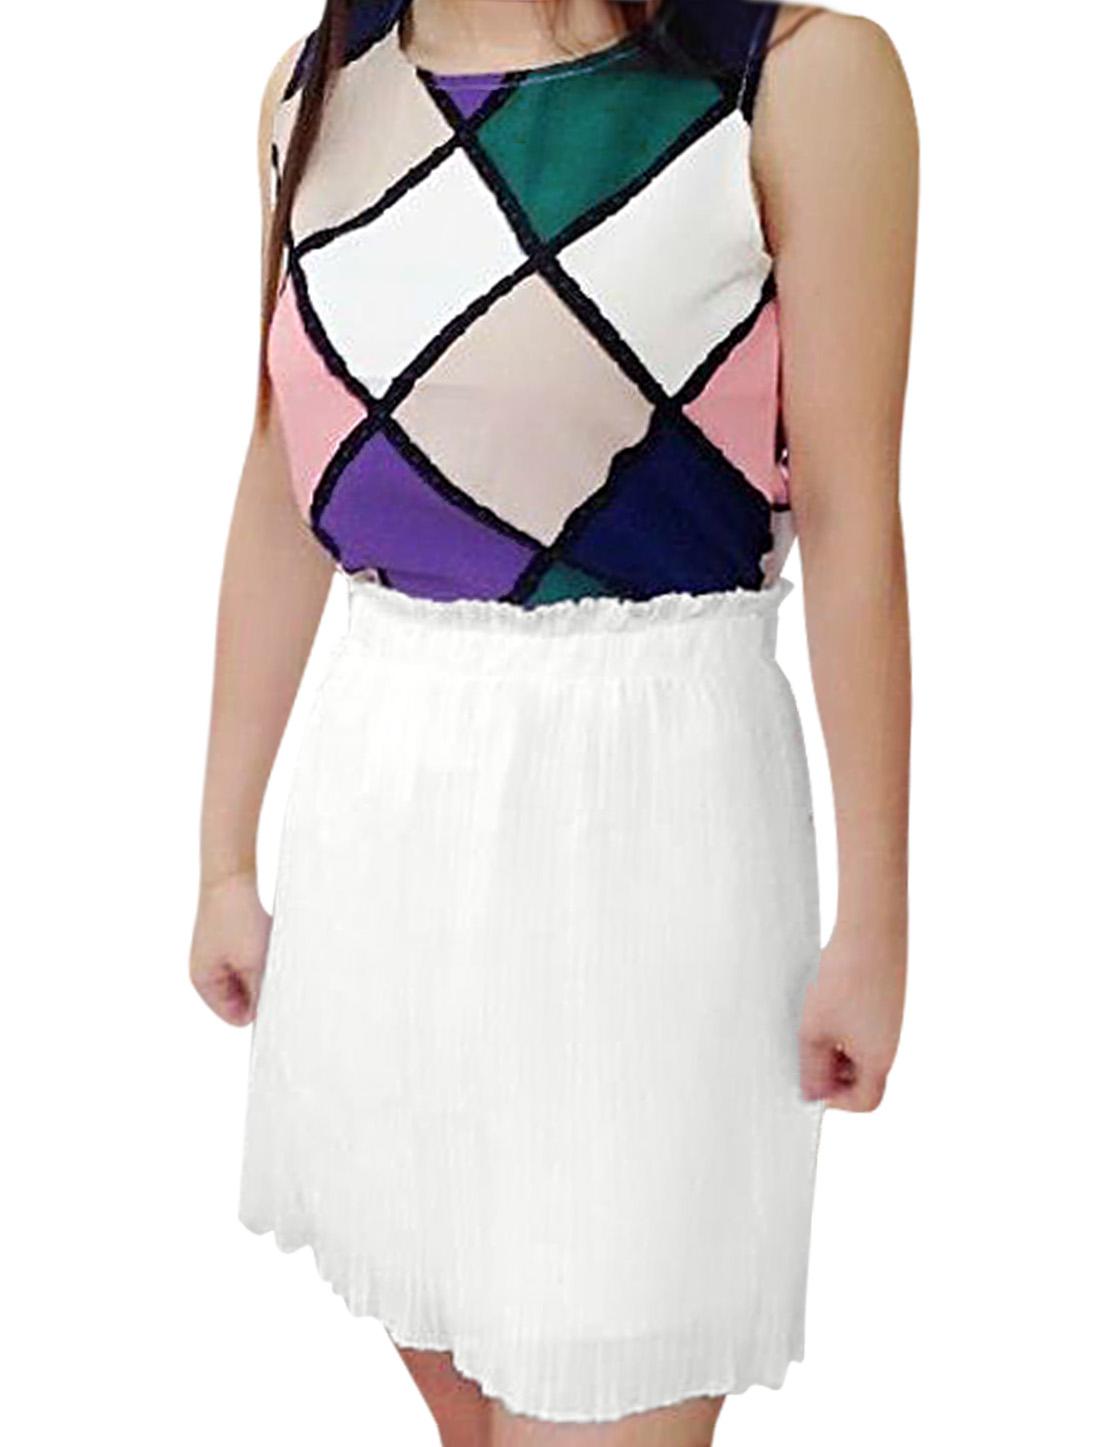 Lady Elastic Waist Pleated White Skirt w Argyle Prints Sleeveless Pink Top XS